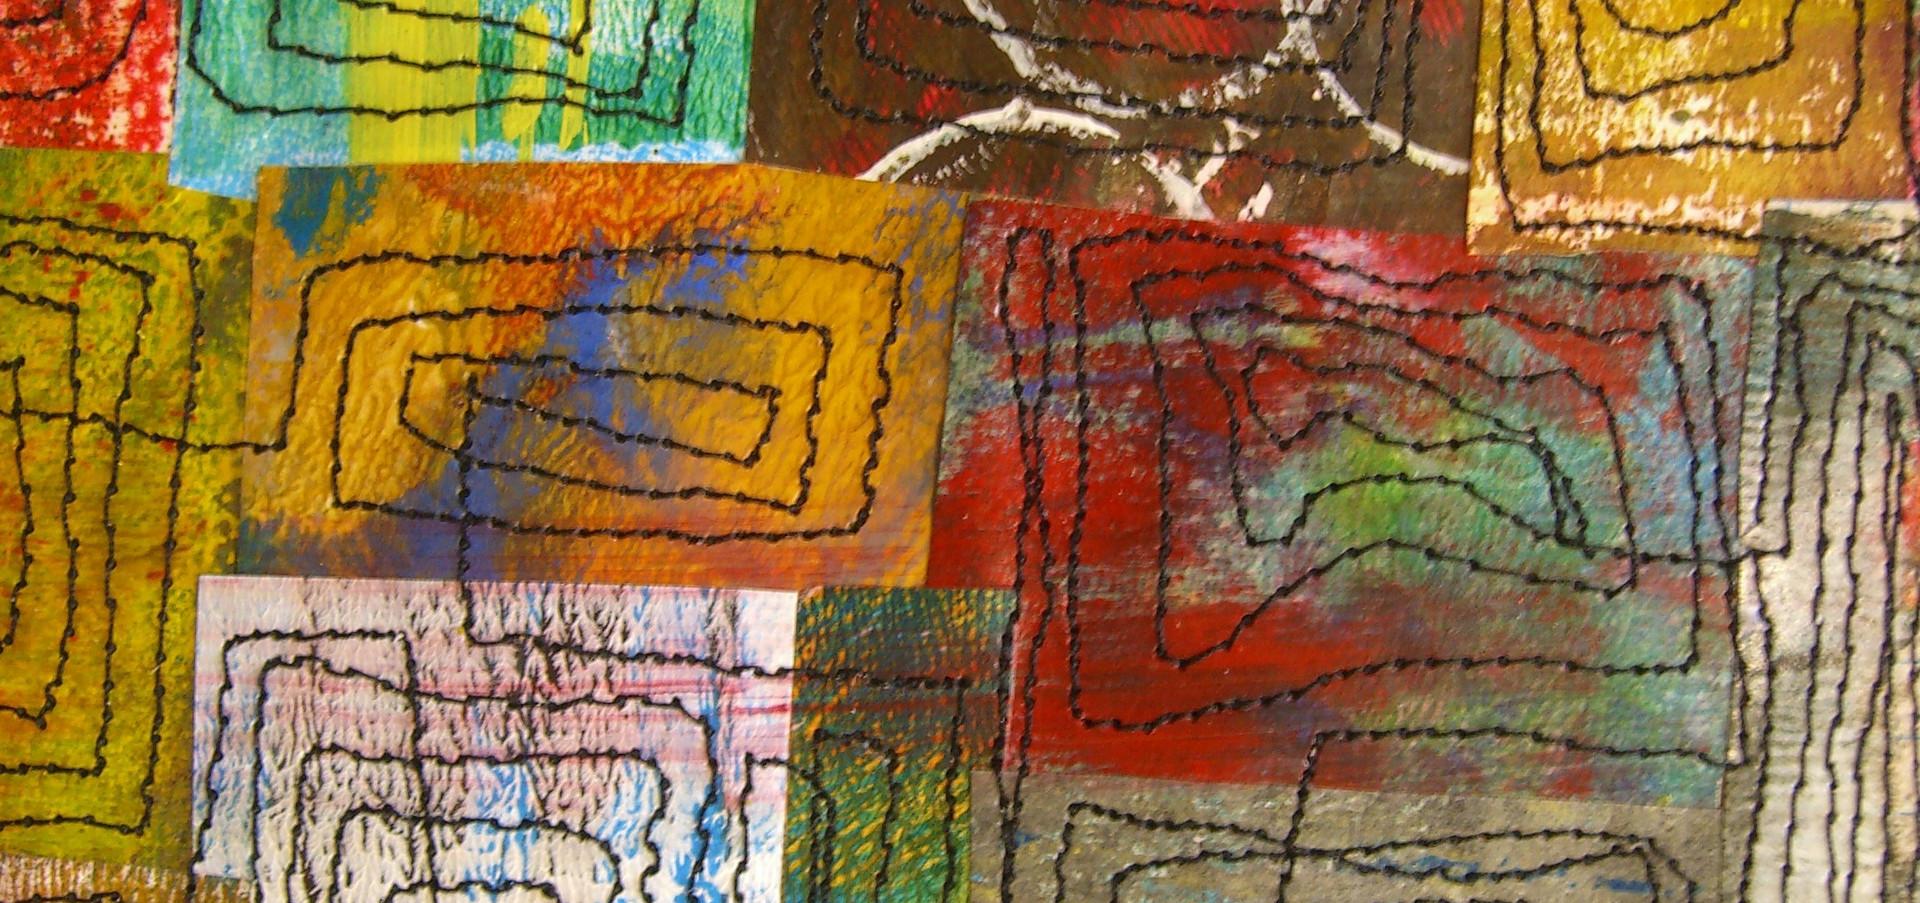 Painted Paper Quilt # 6 (Detail 1)